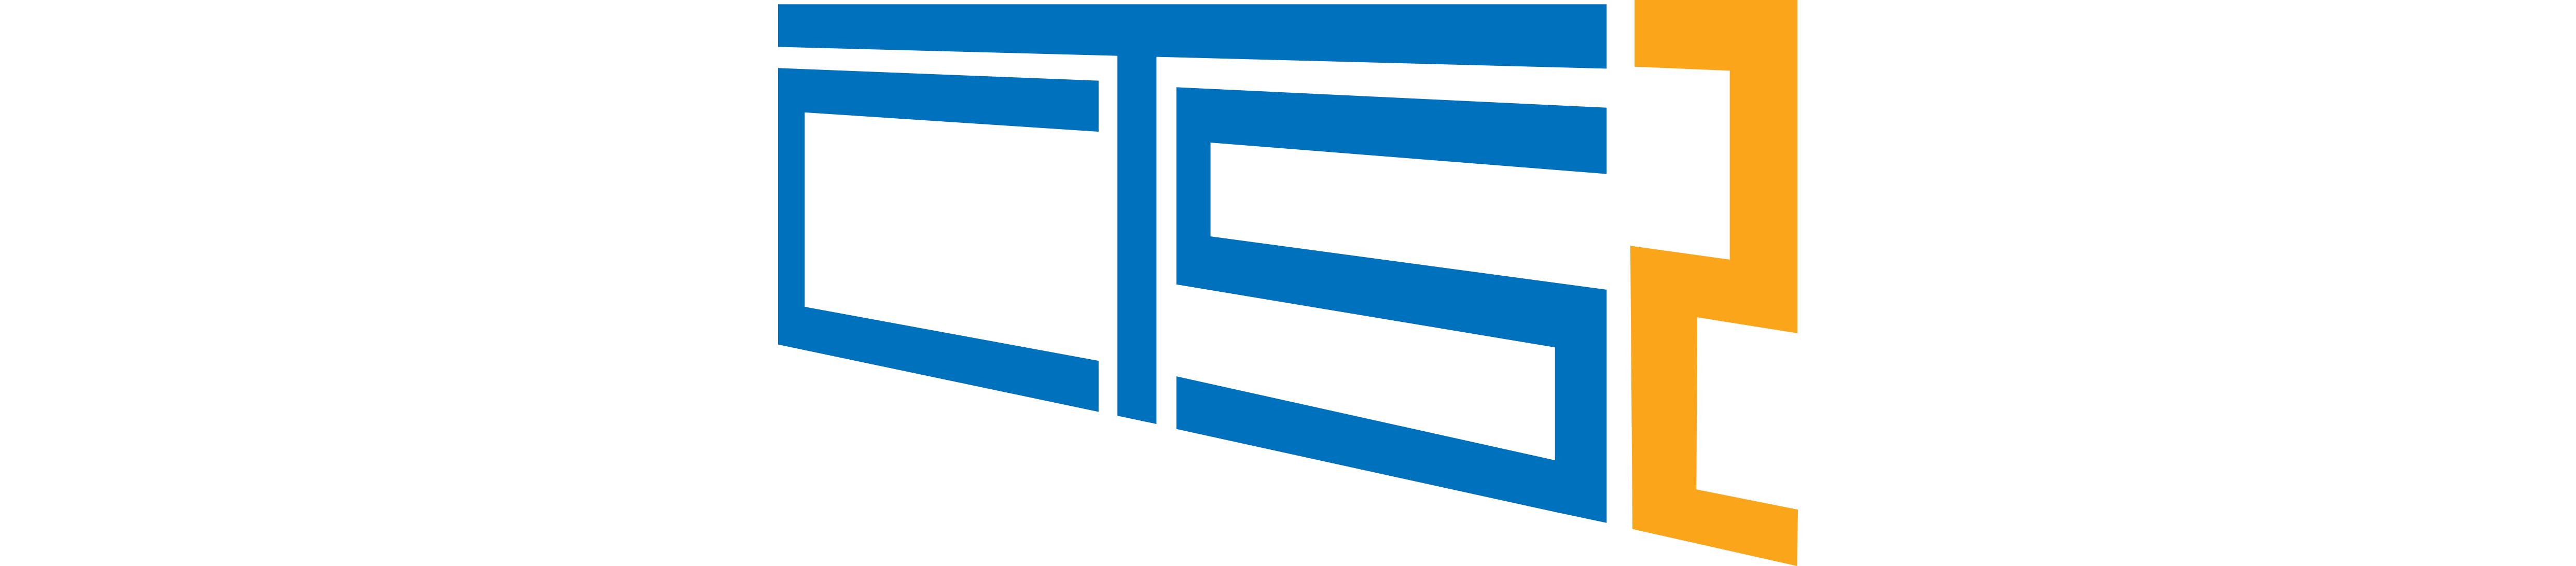 CTS-2 logo